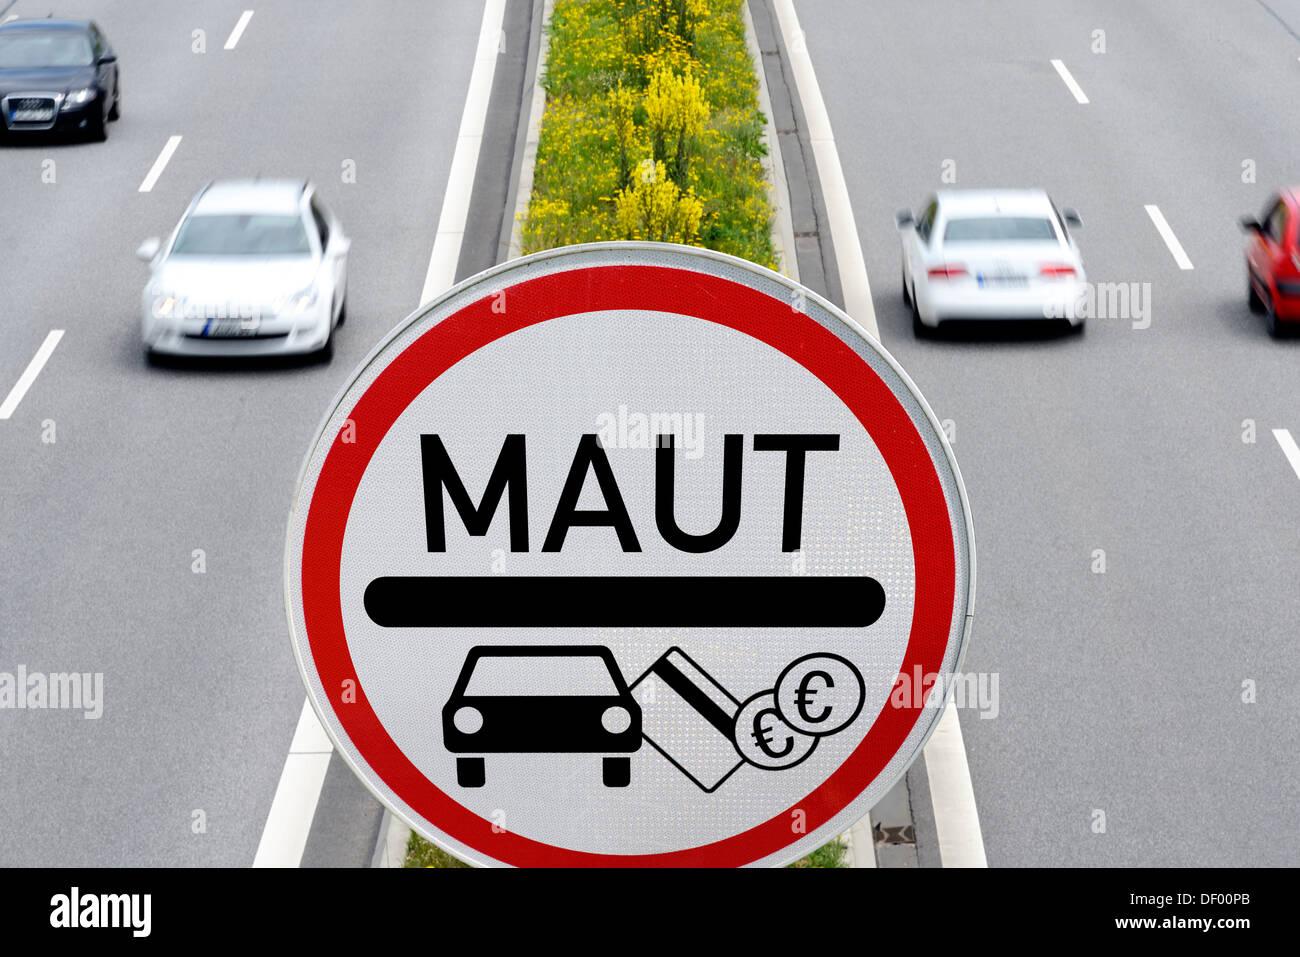 Highway with passenger car toll sign, photomontage, Autobahn mit PKW-Maut-Schild, Fotomontage - Stock Image